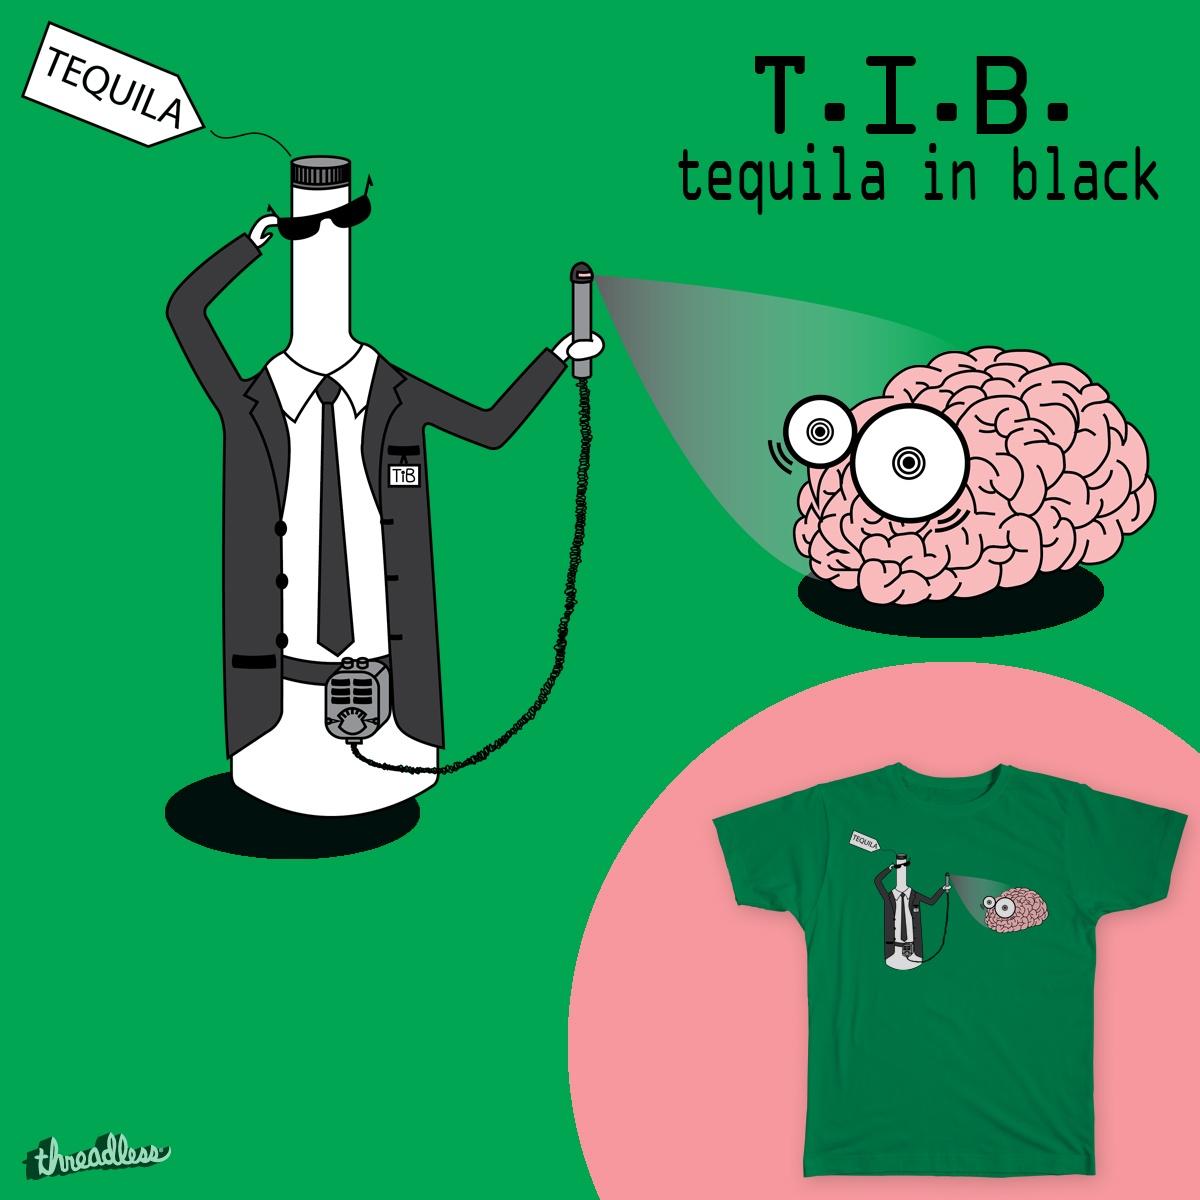 TIB tequila in black by DenLB on Threadless